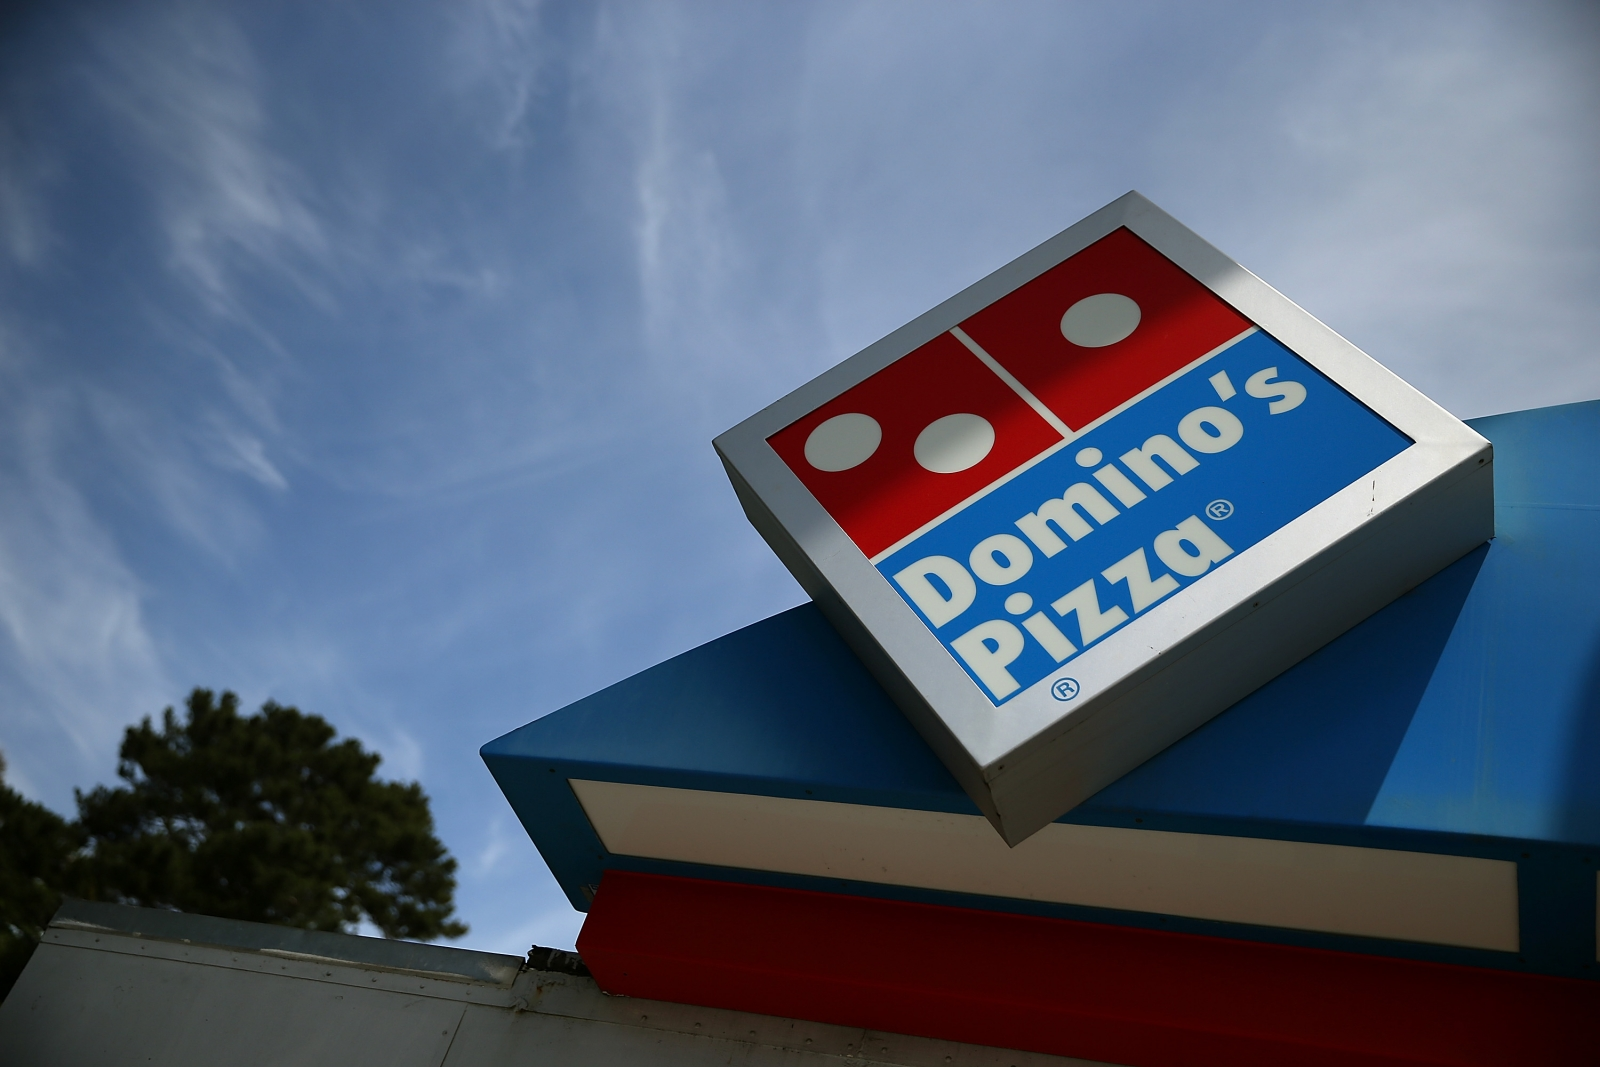 Domino's GPS tracking customers